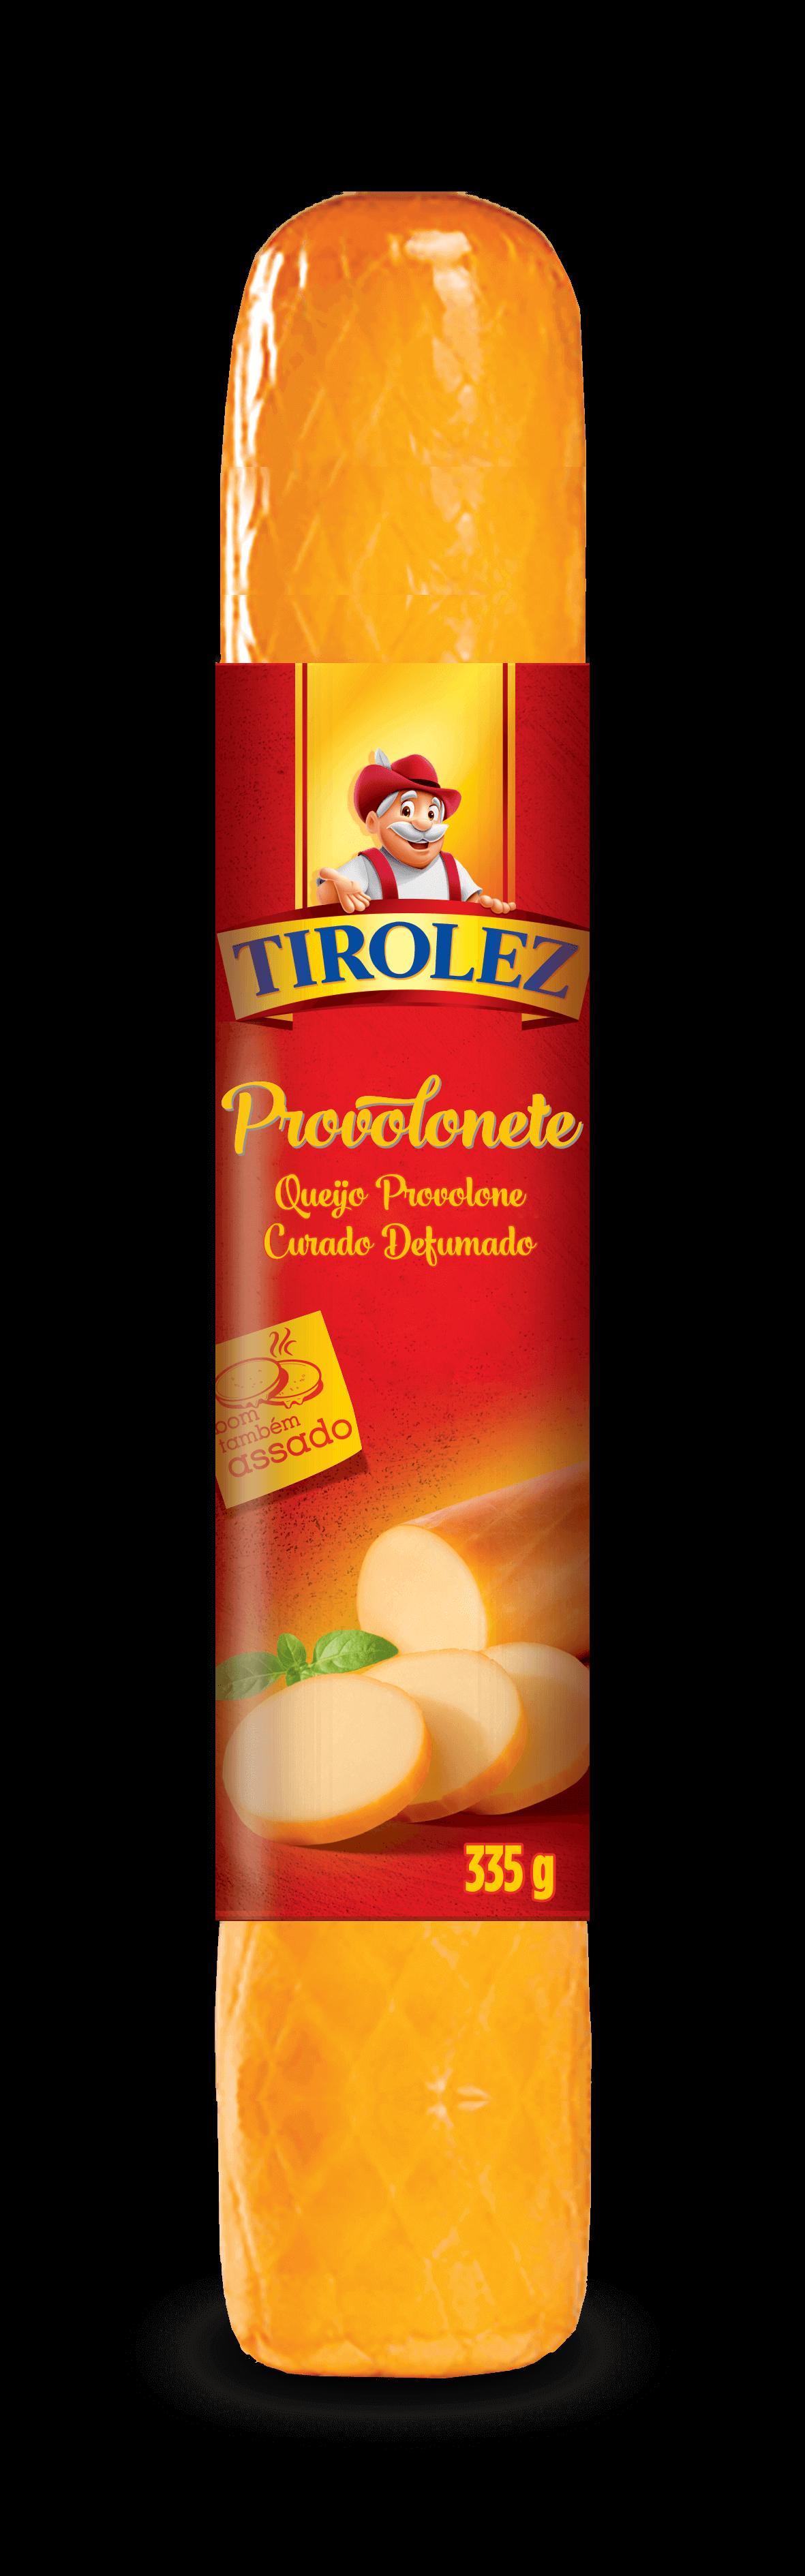 QUEIJO PROVOLONETE Tirolez 335g